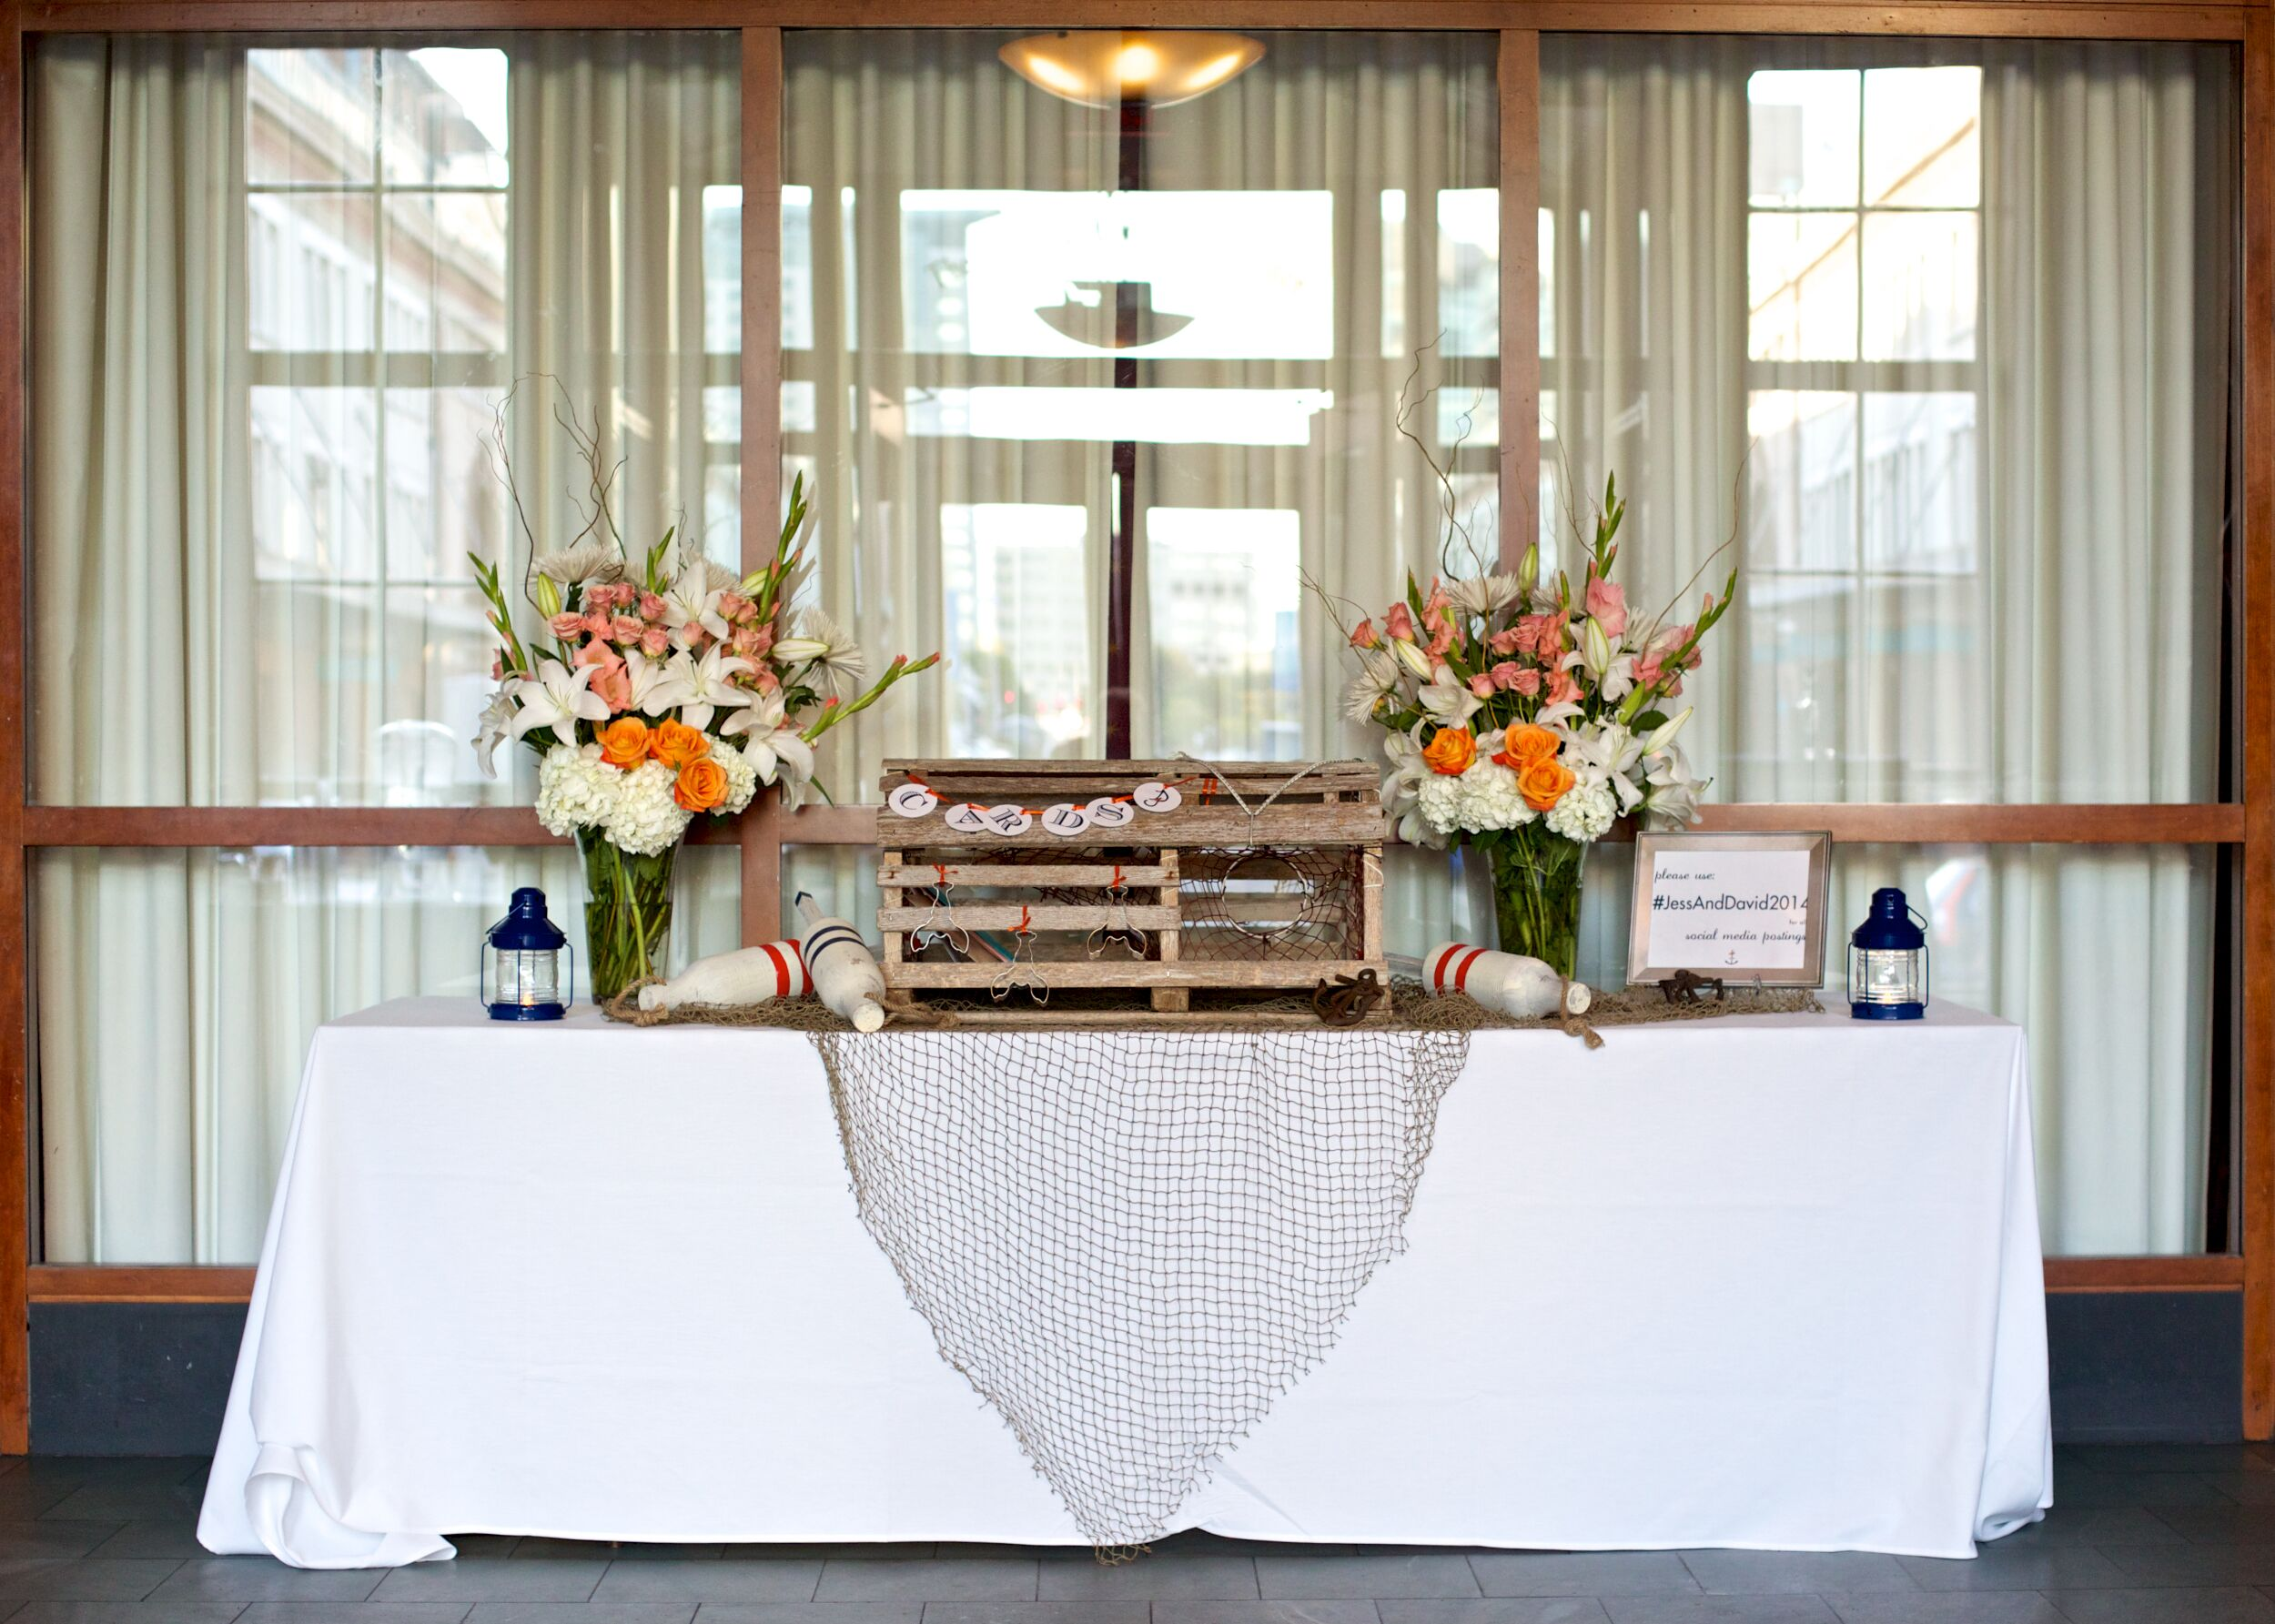 Nautical wedding decor with lobster trap card box - Trap decor ...